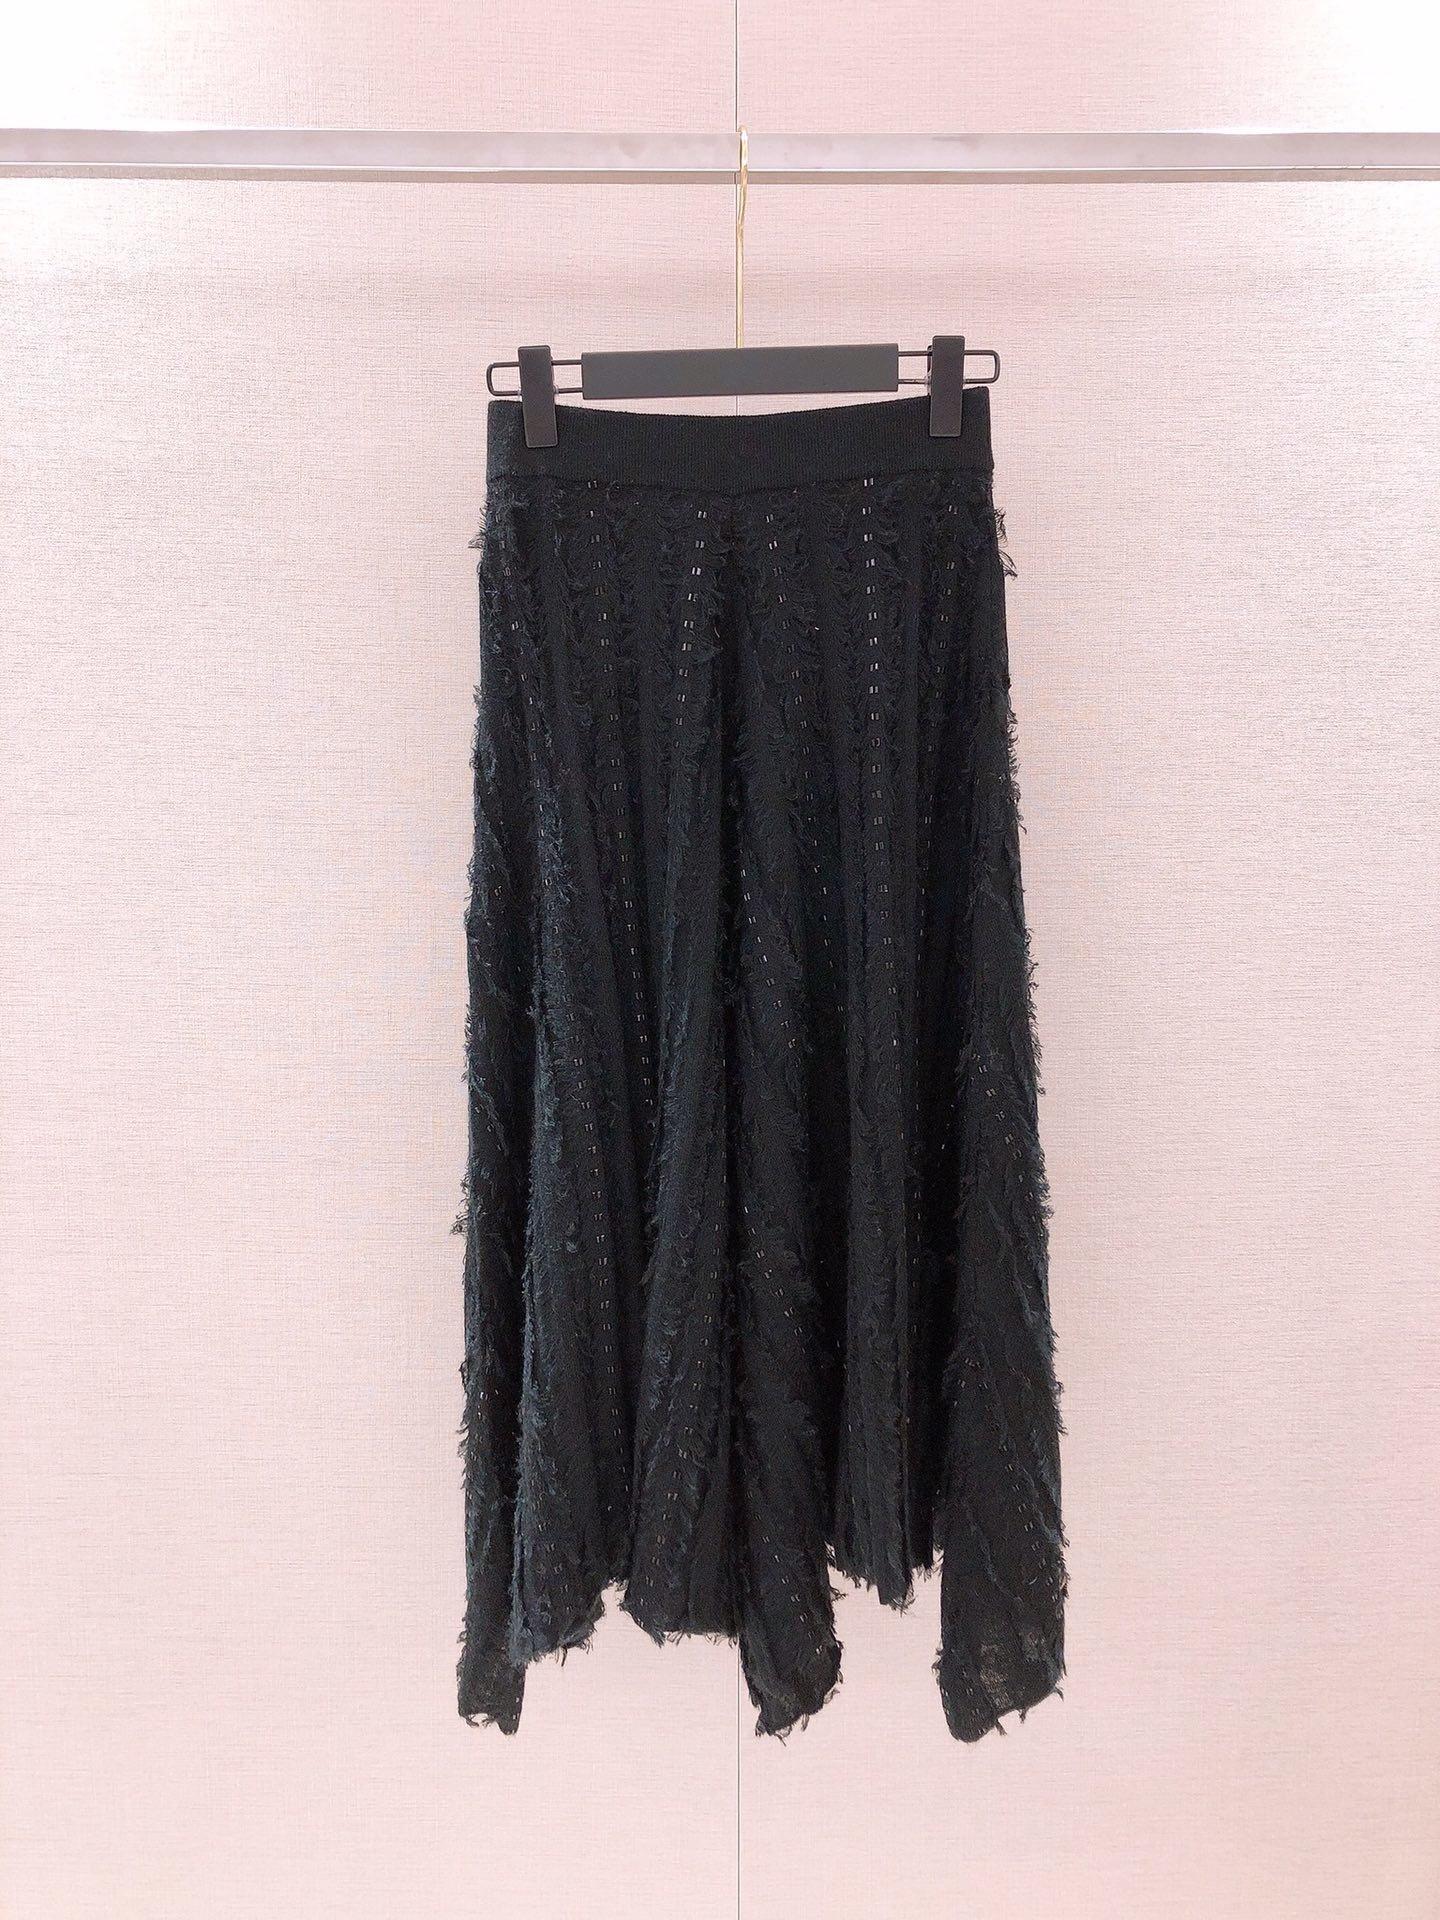 Half-Skirt Fringed Knitted Sexy Fashion Ladies New 0925 Rhinestone Irregular Pure-Color